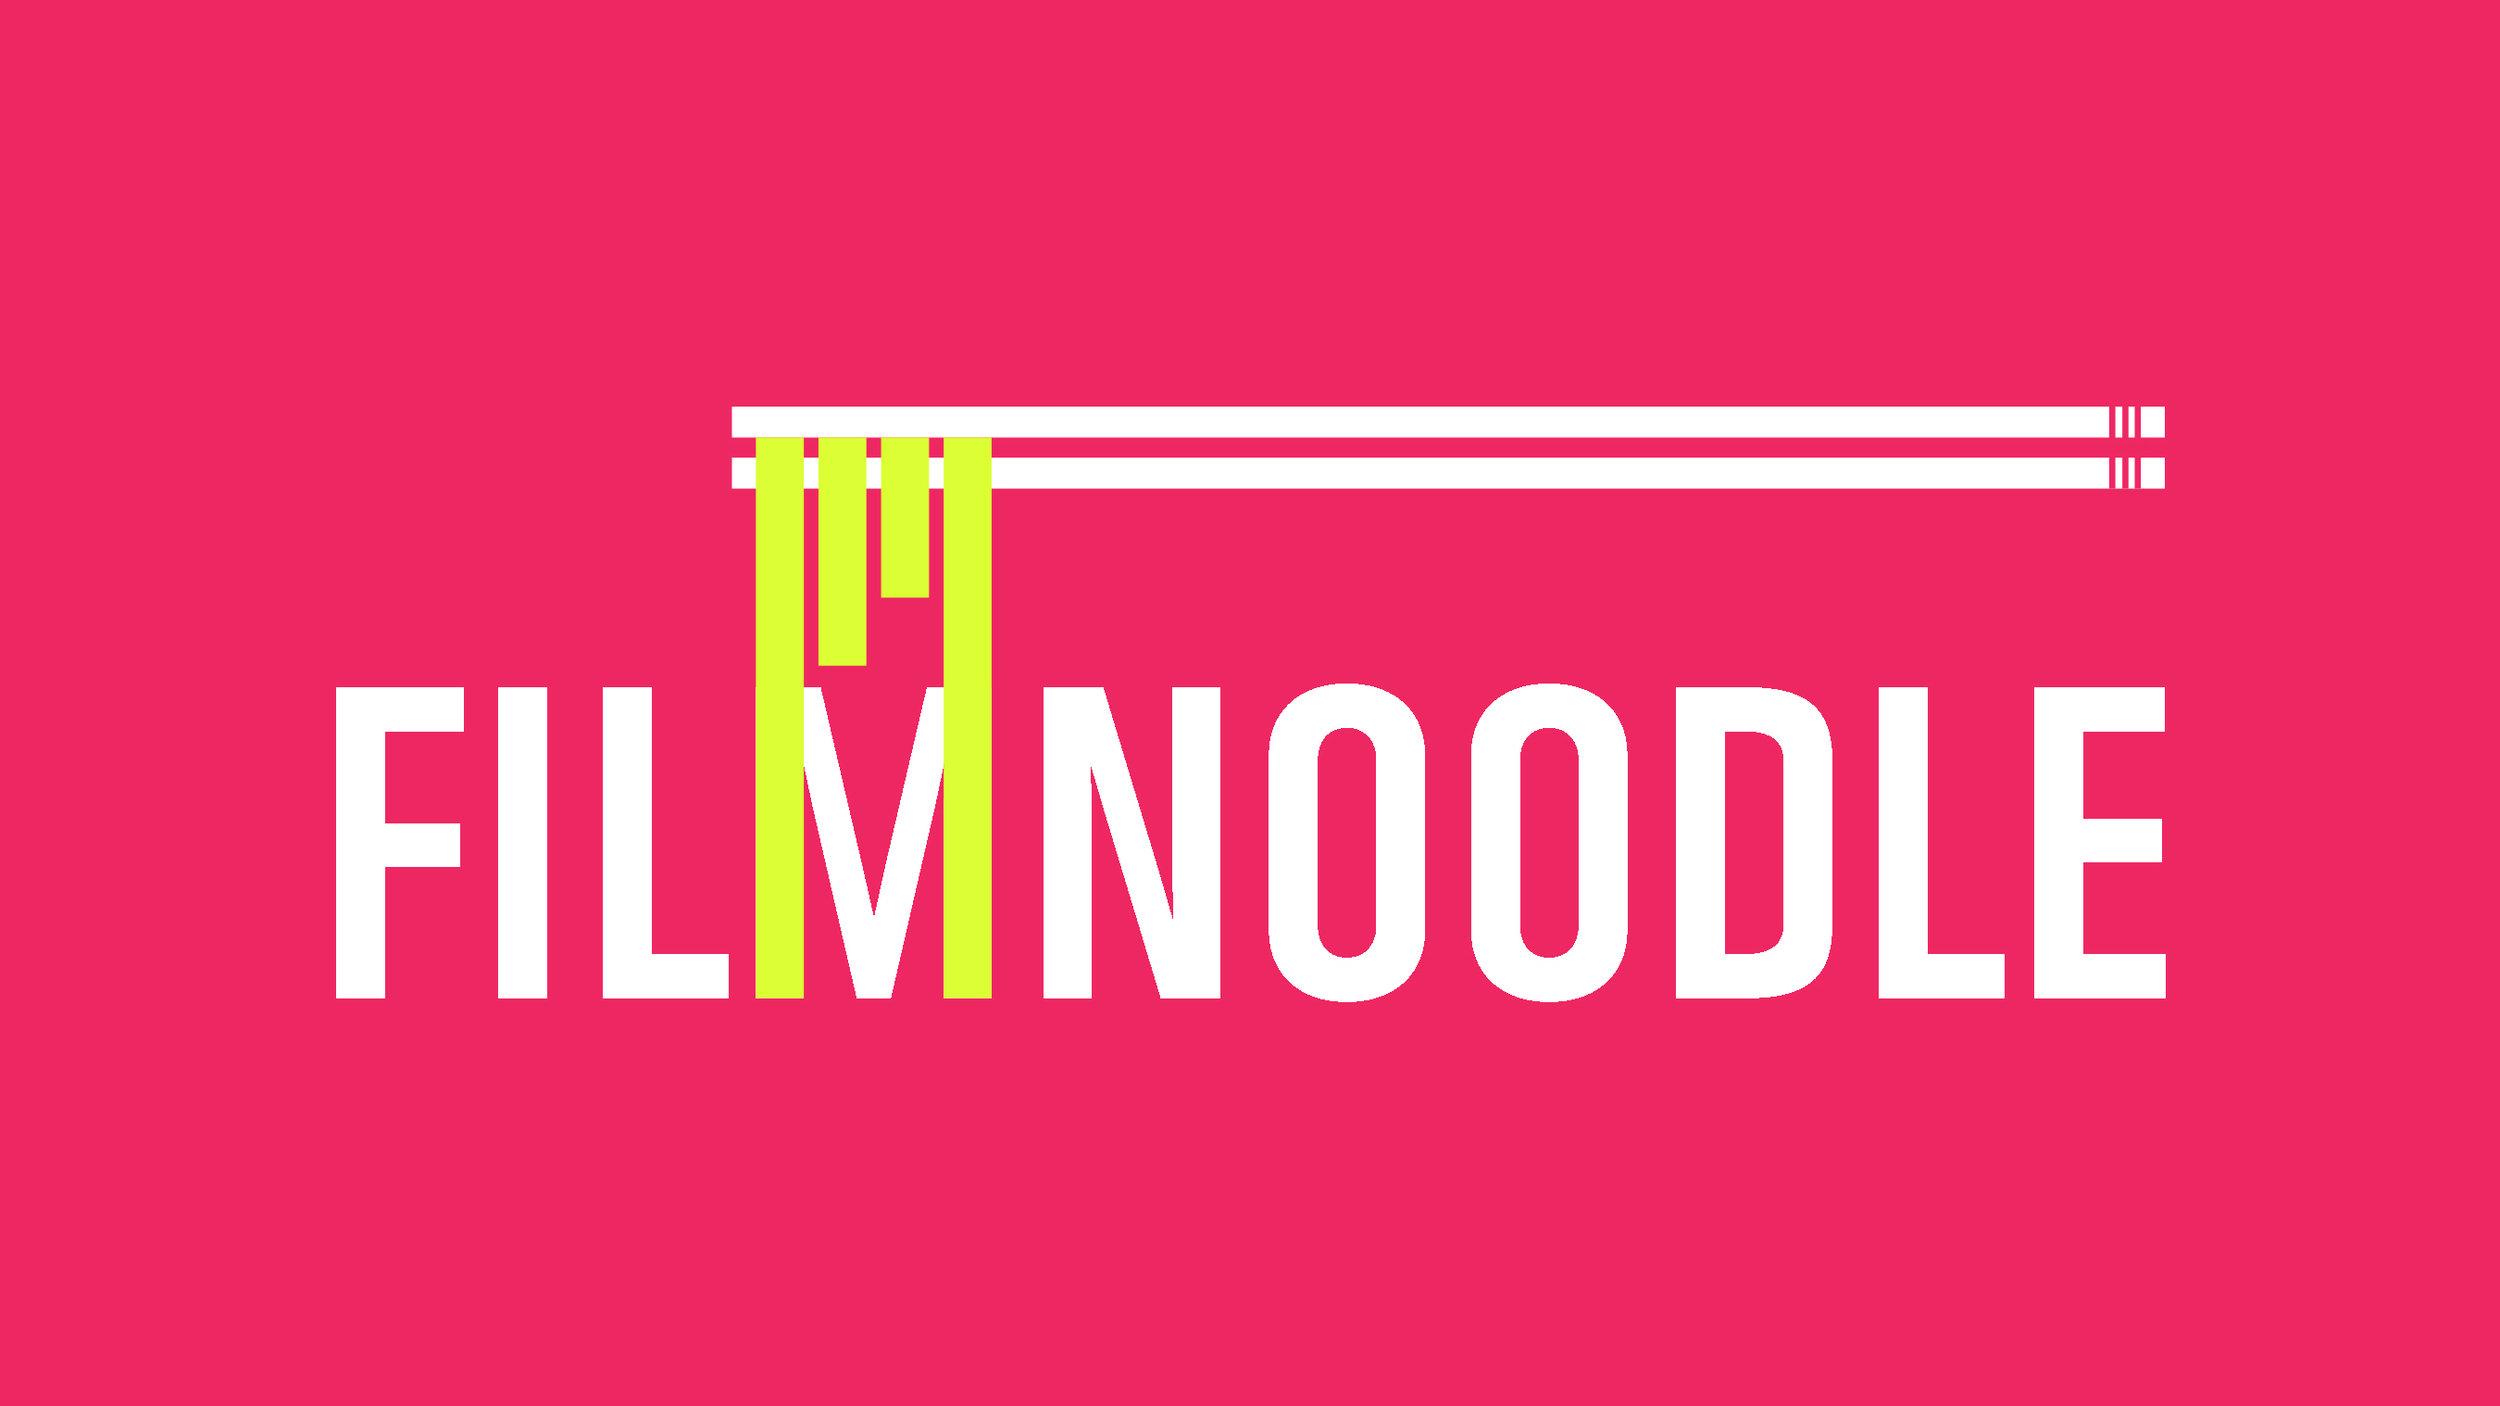 FILMNOODLE Logo.jpg